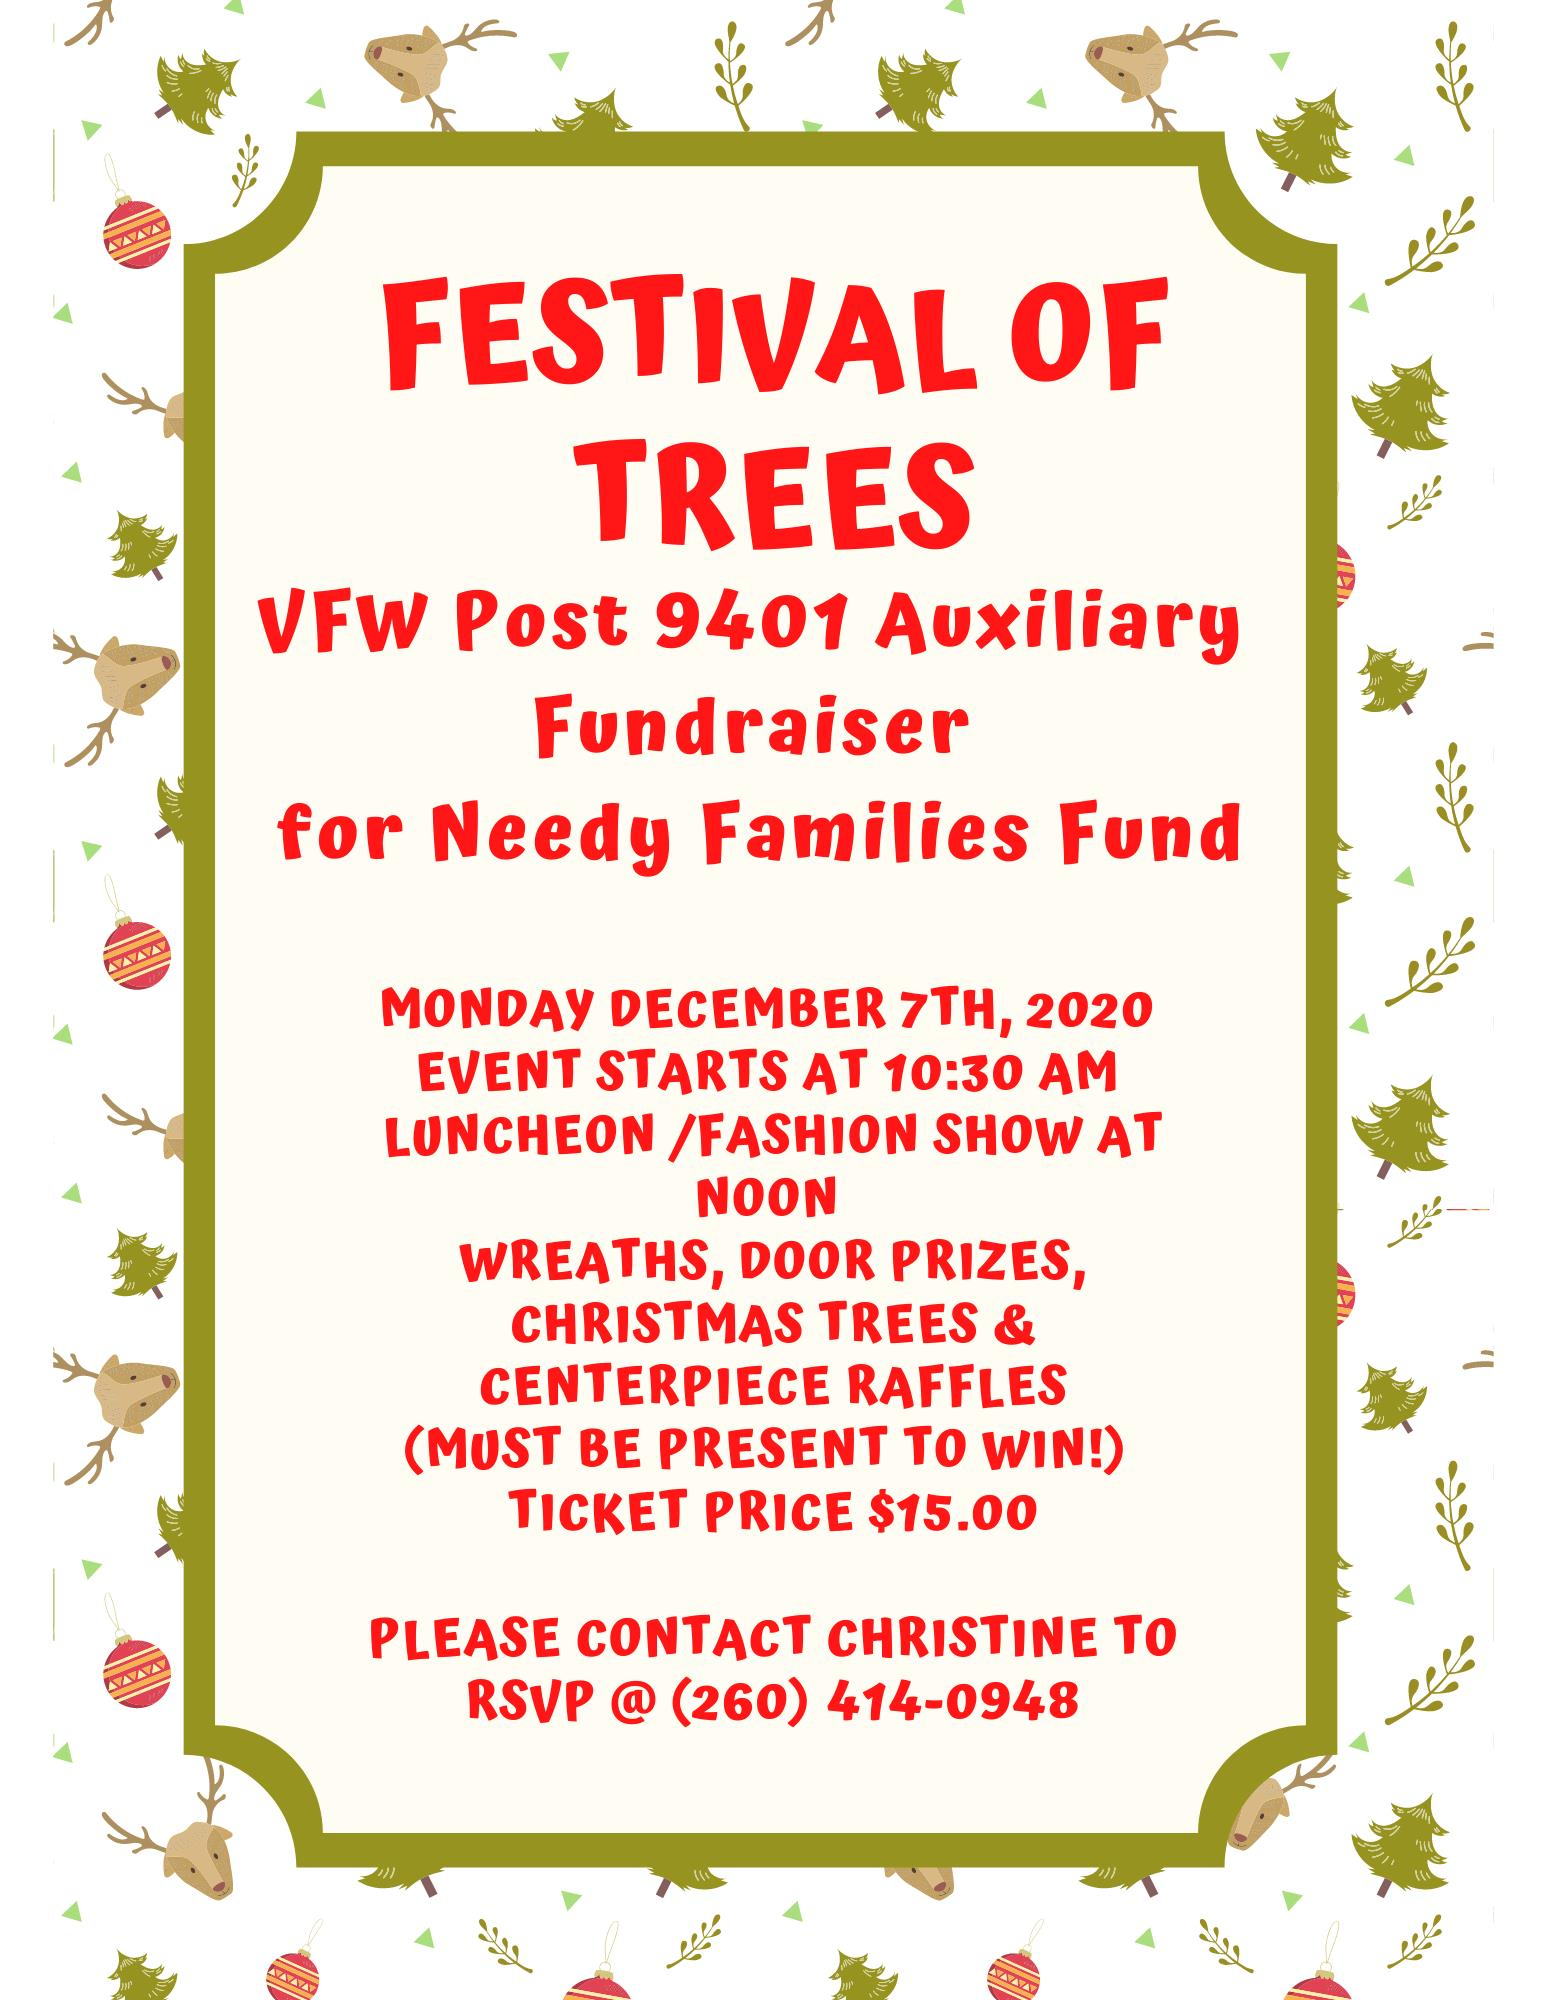 VFW Post 9401 Festival of Trees